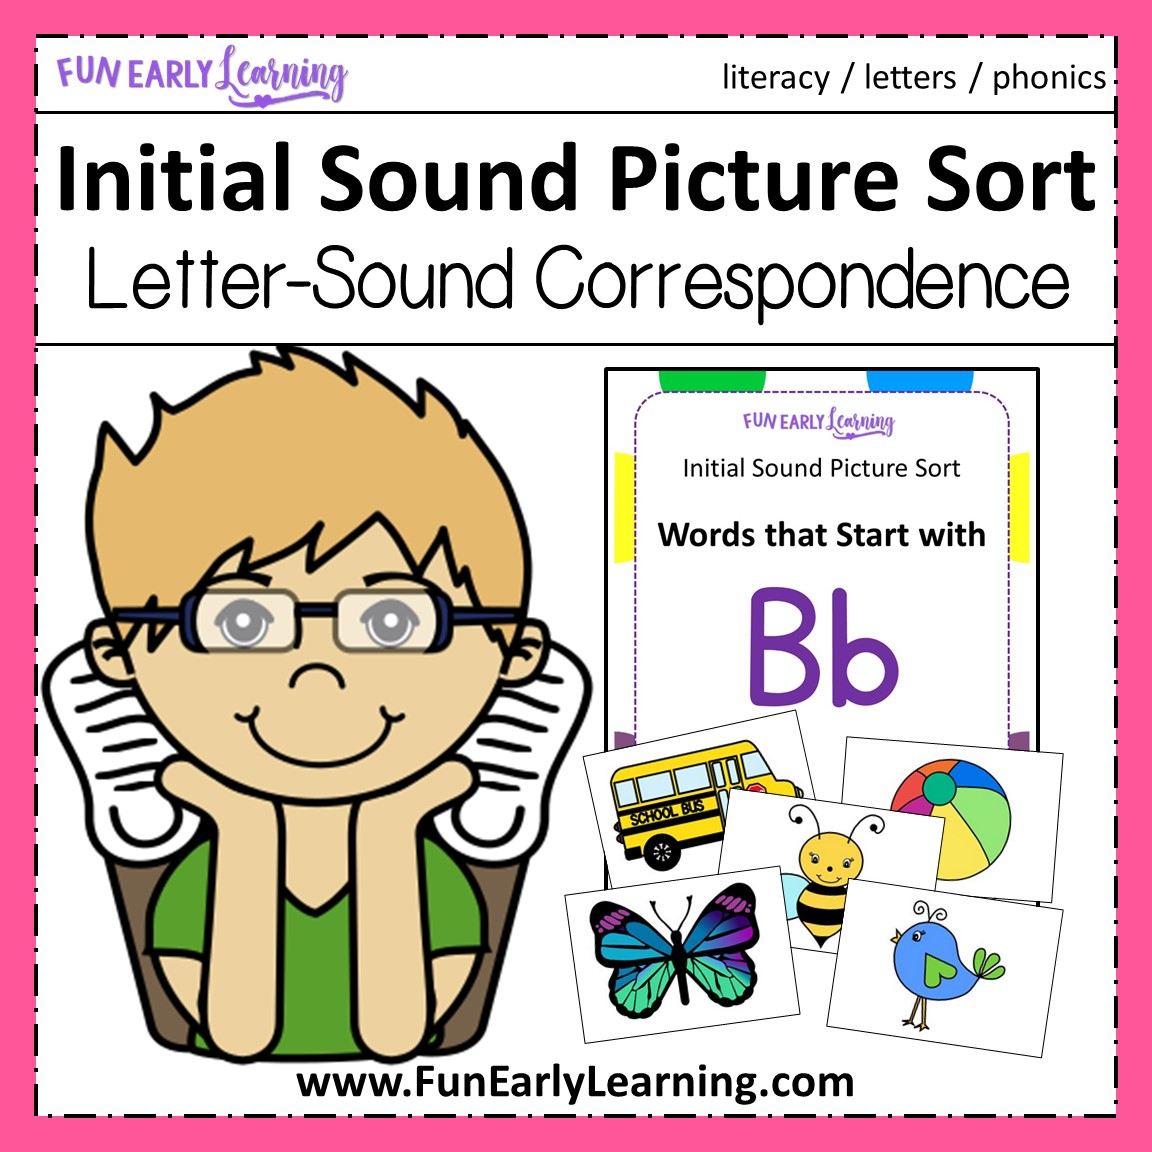 Initial Sound Picture Sort - Phonics Activity